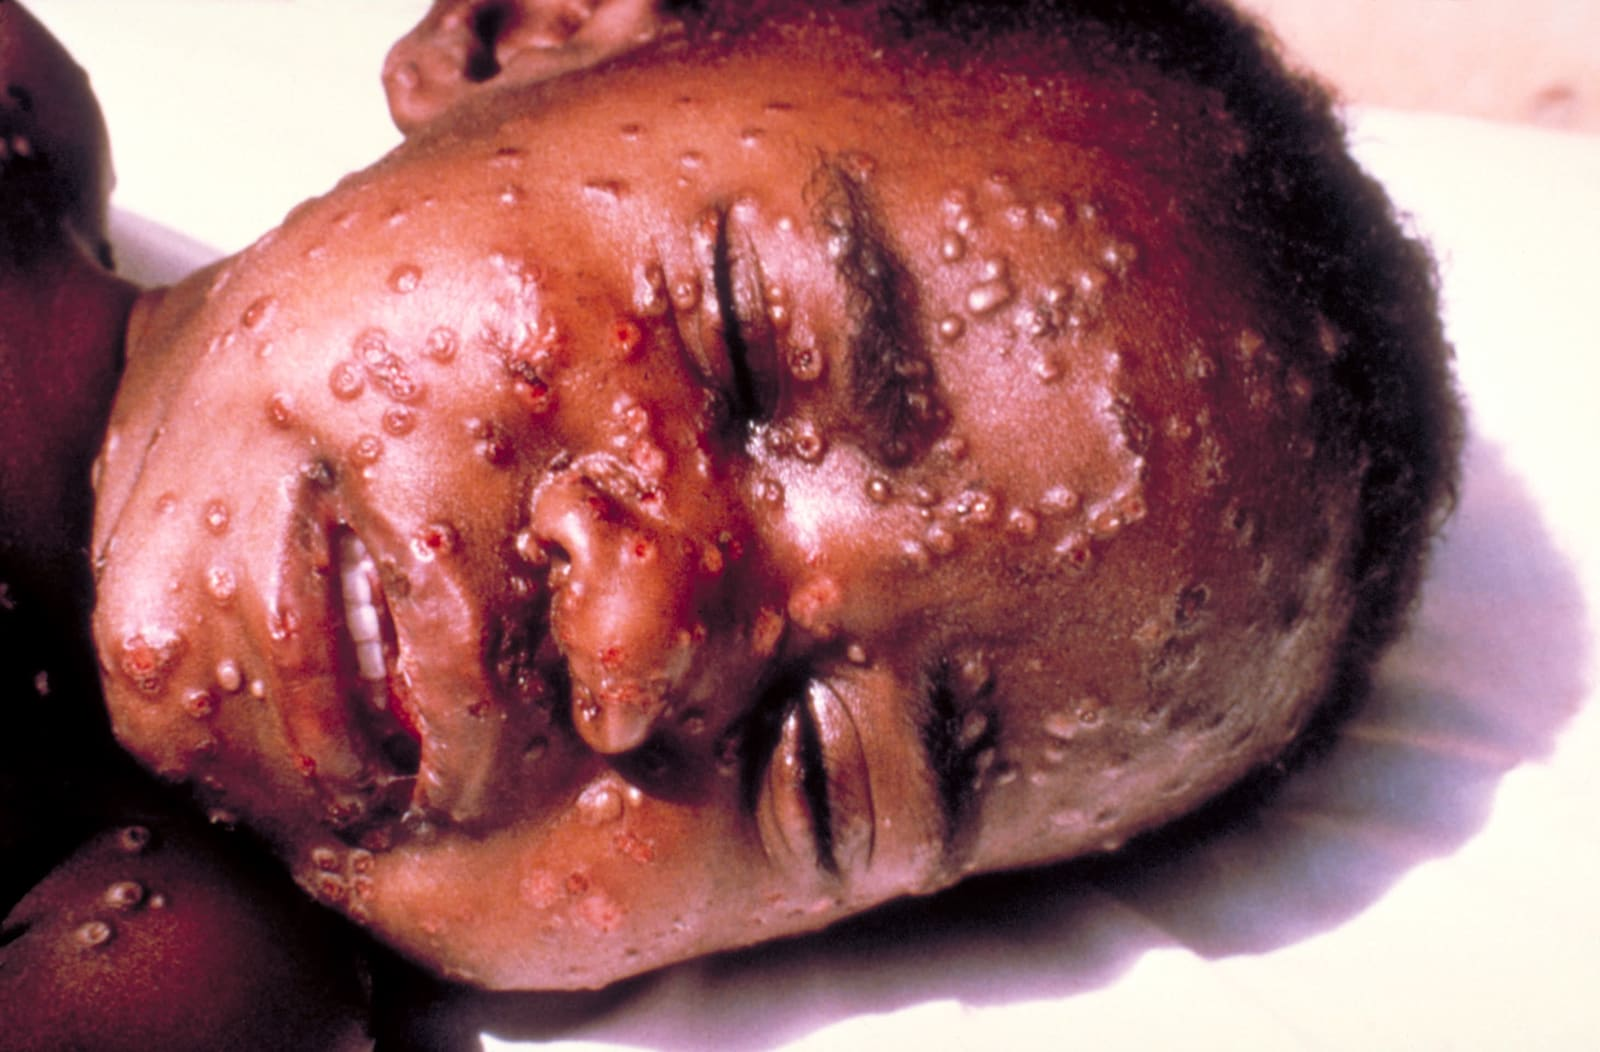 Boy With Smallpox